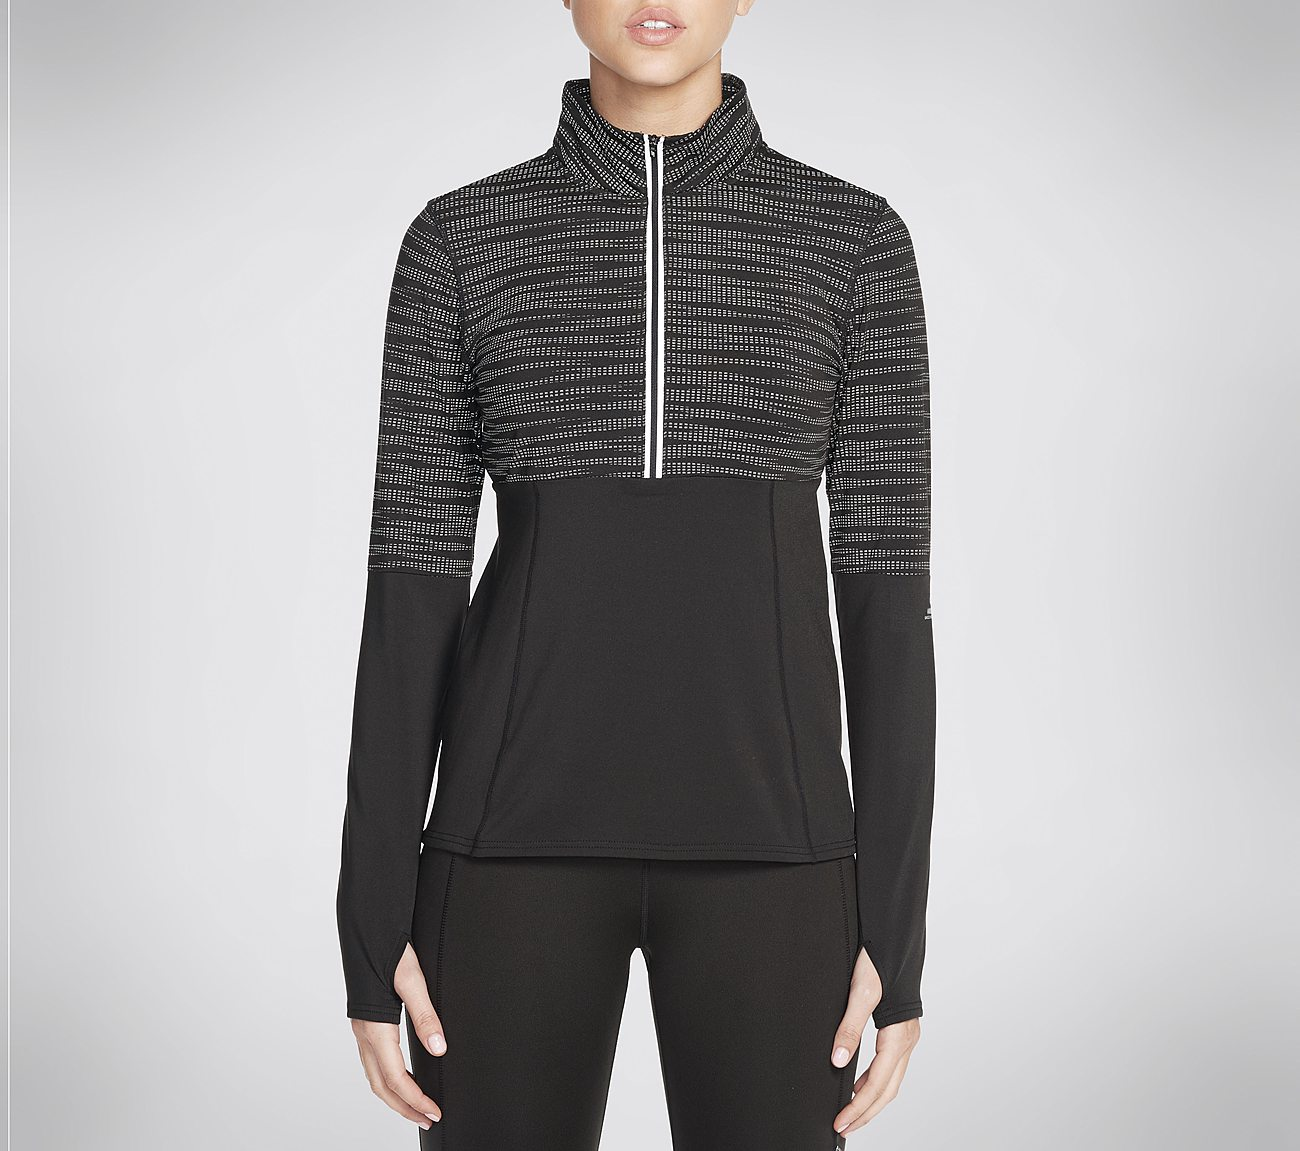 GOTherm360 Peak Long Sleeve Pullover Sweatshirt